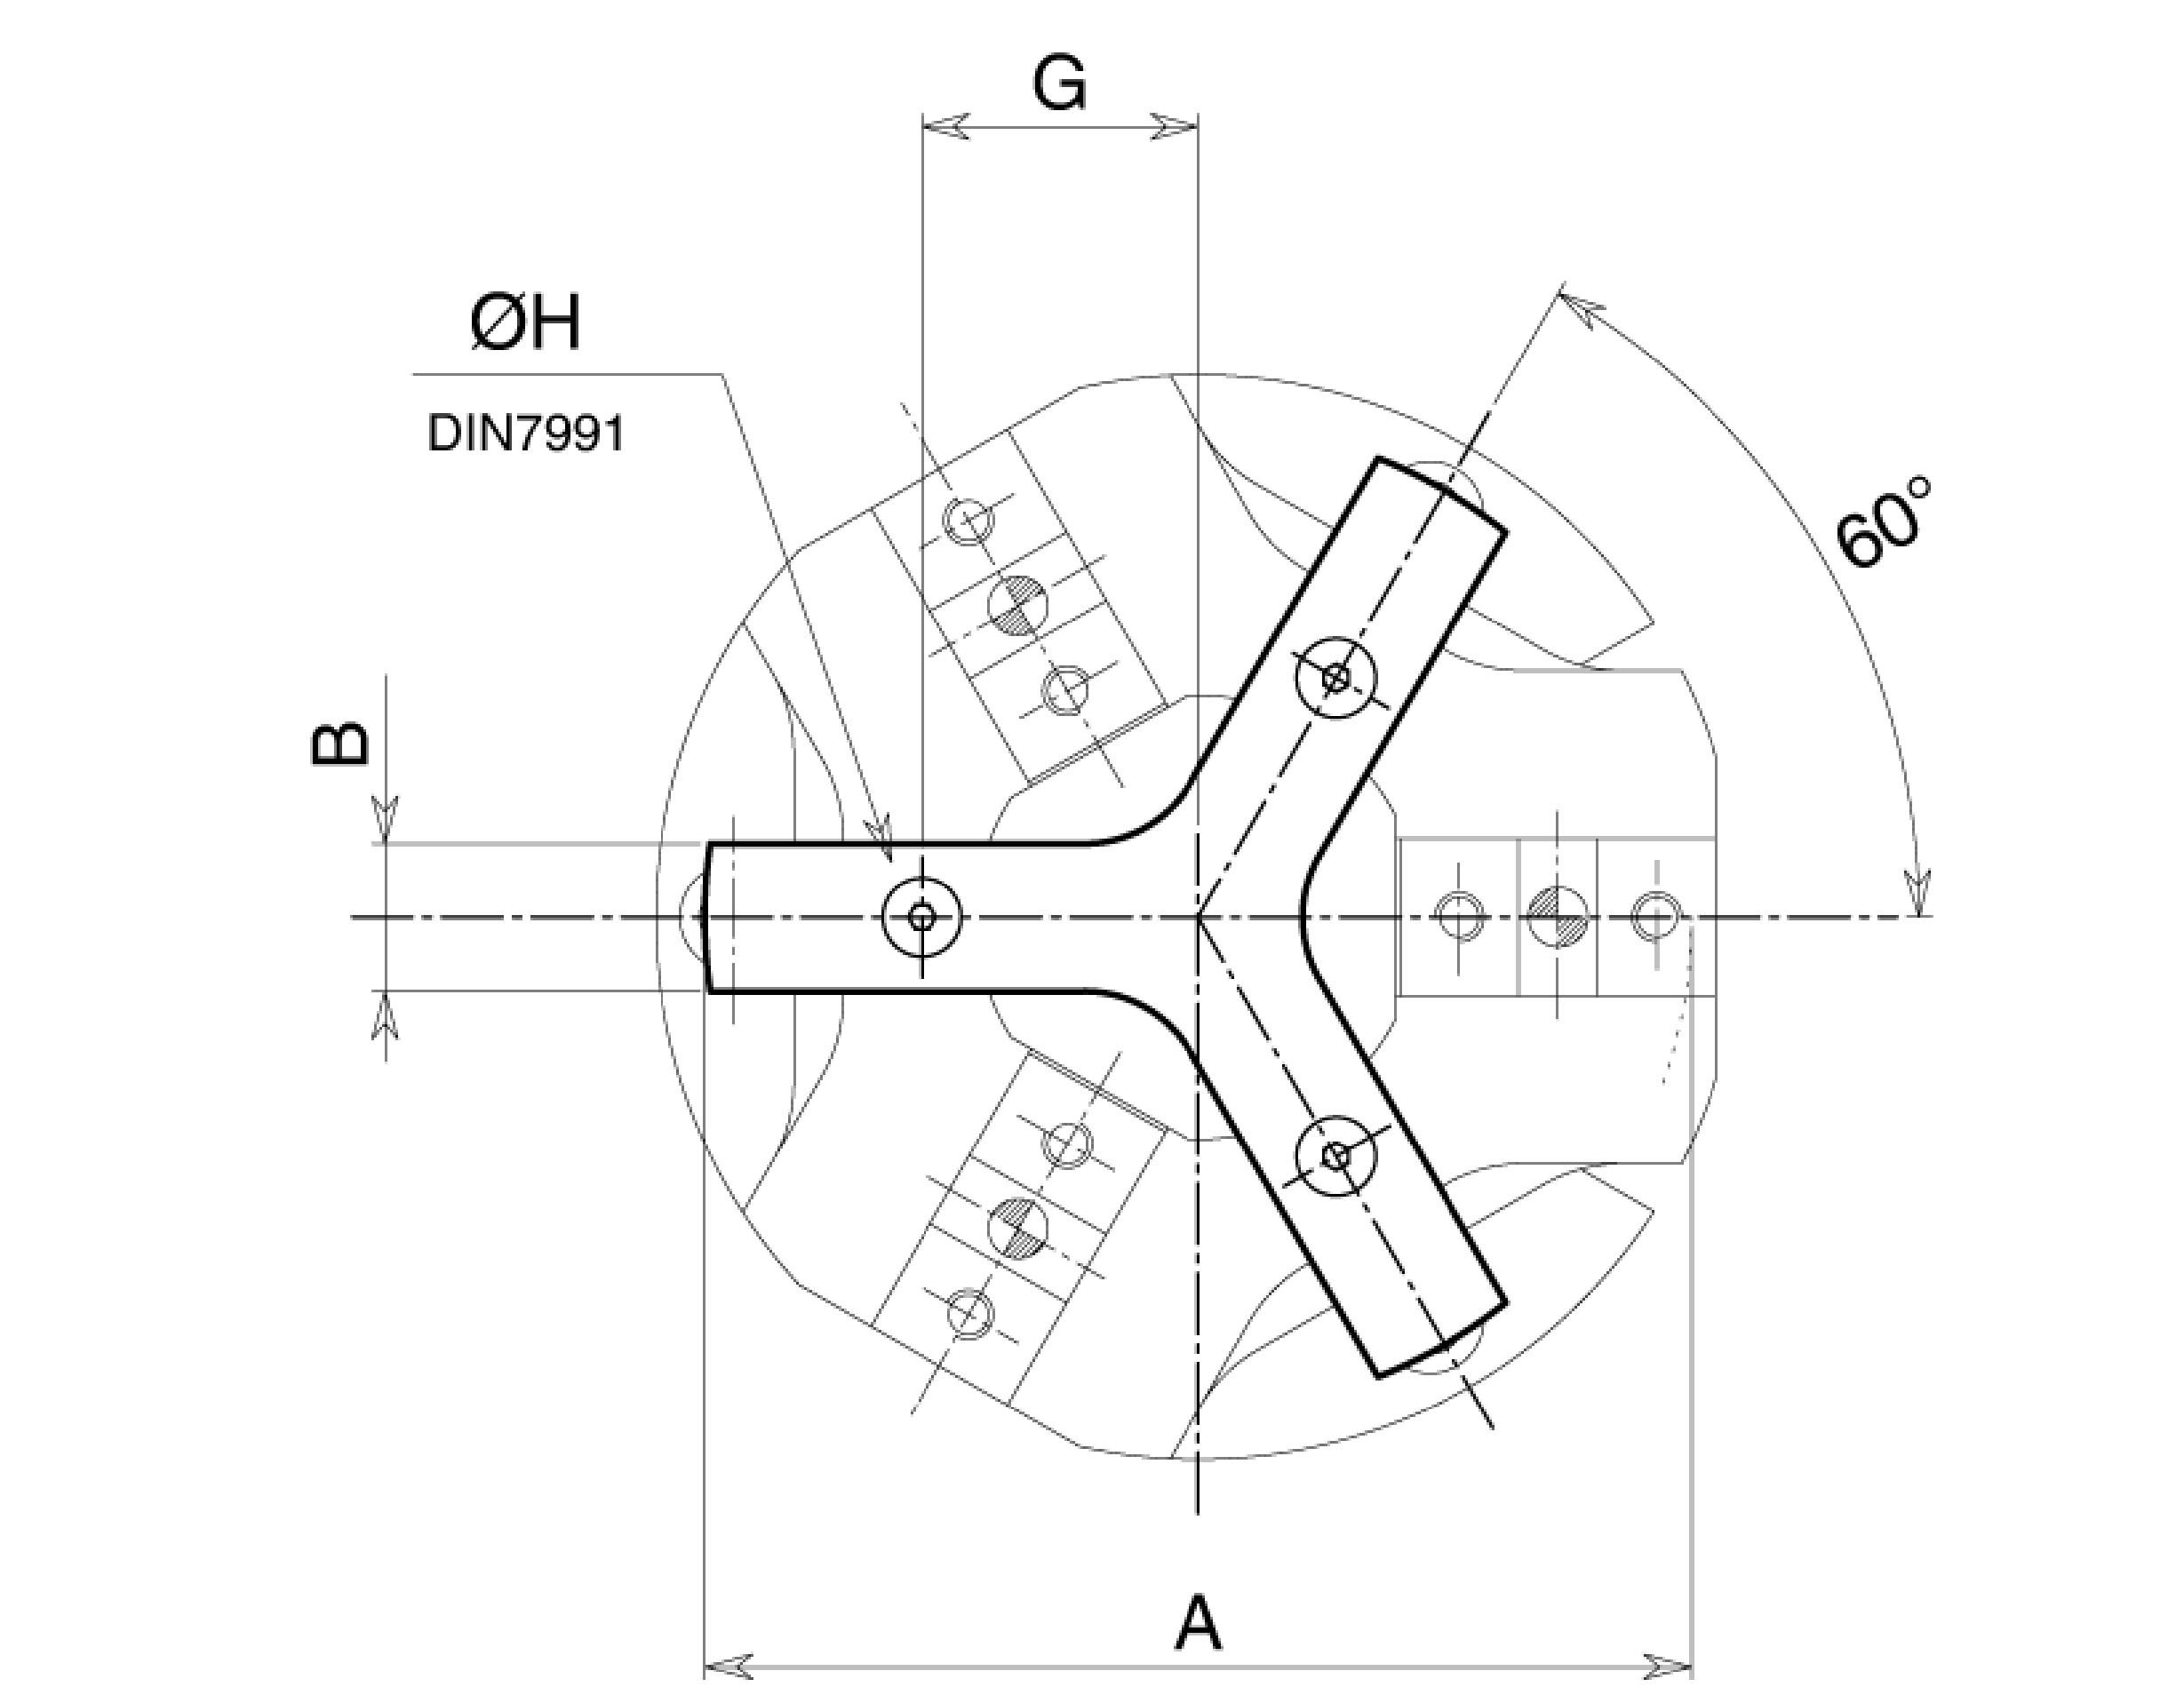 Dispositivo stabilizzatore pinze pneumatiche Workpiece stabilizer pneumatic grippers